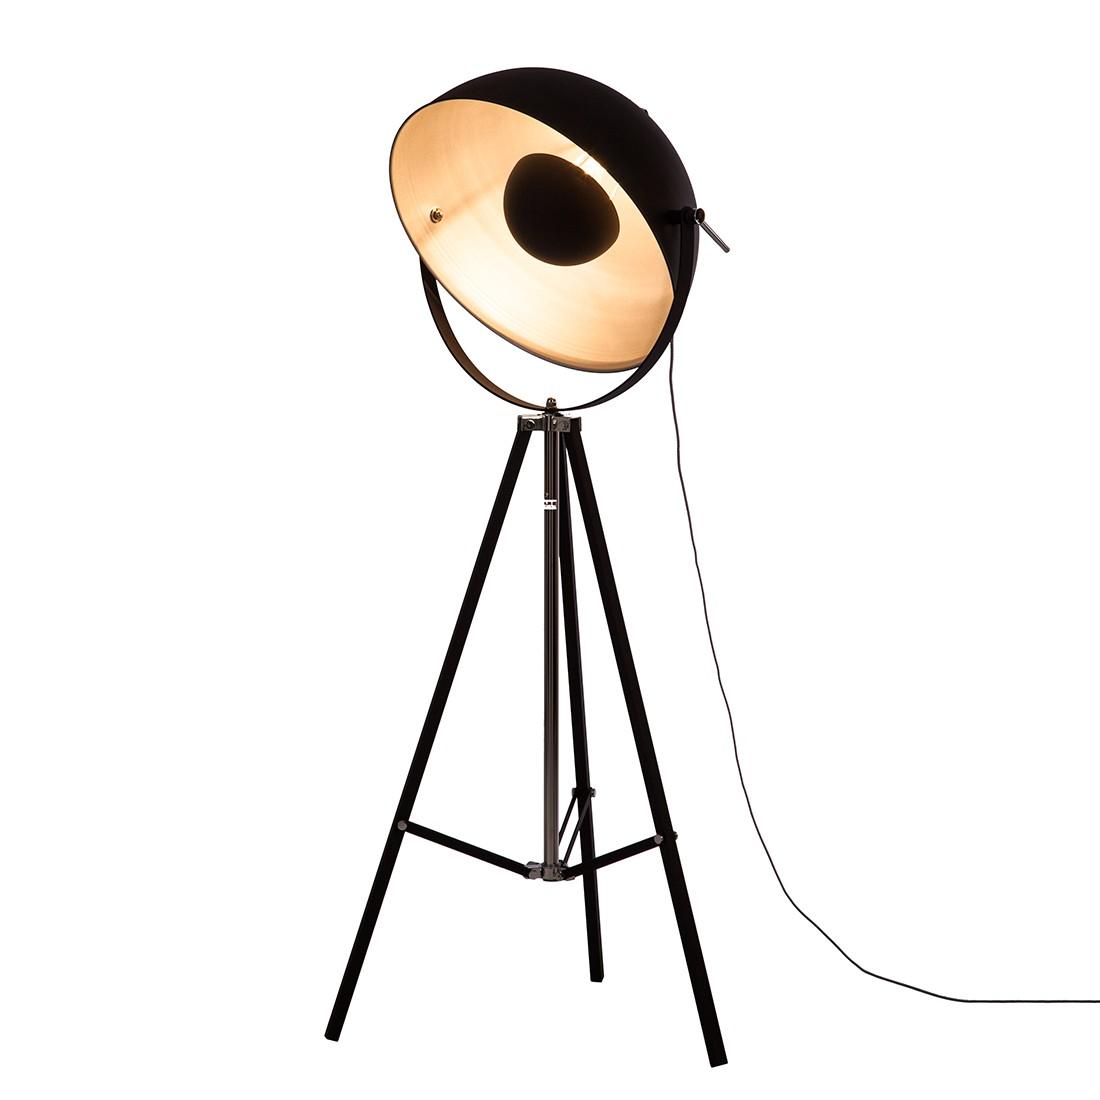 EEK A++, Lampadaire Bowl - Noir, Kare Design